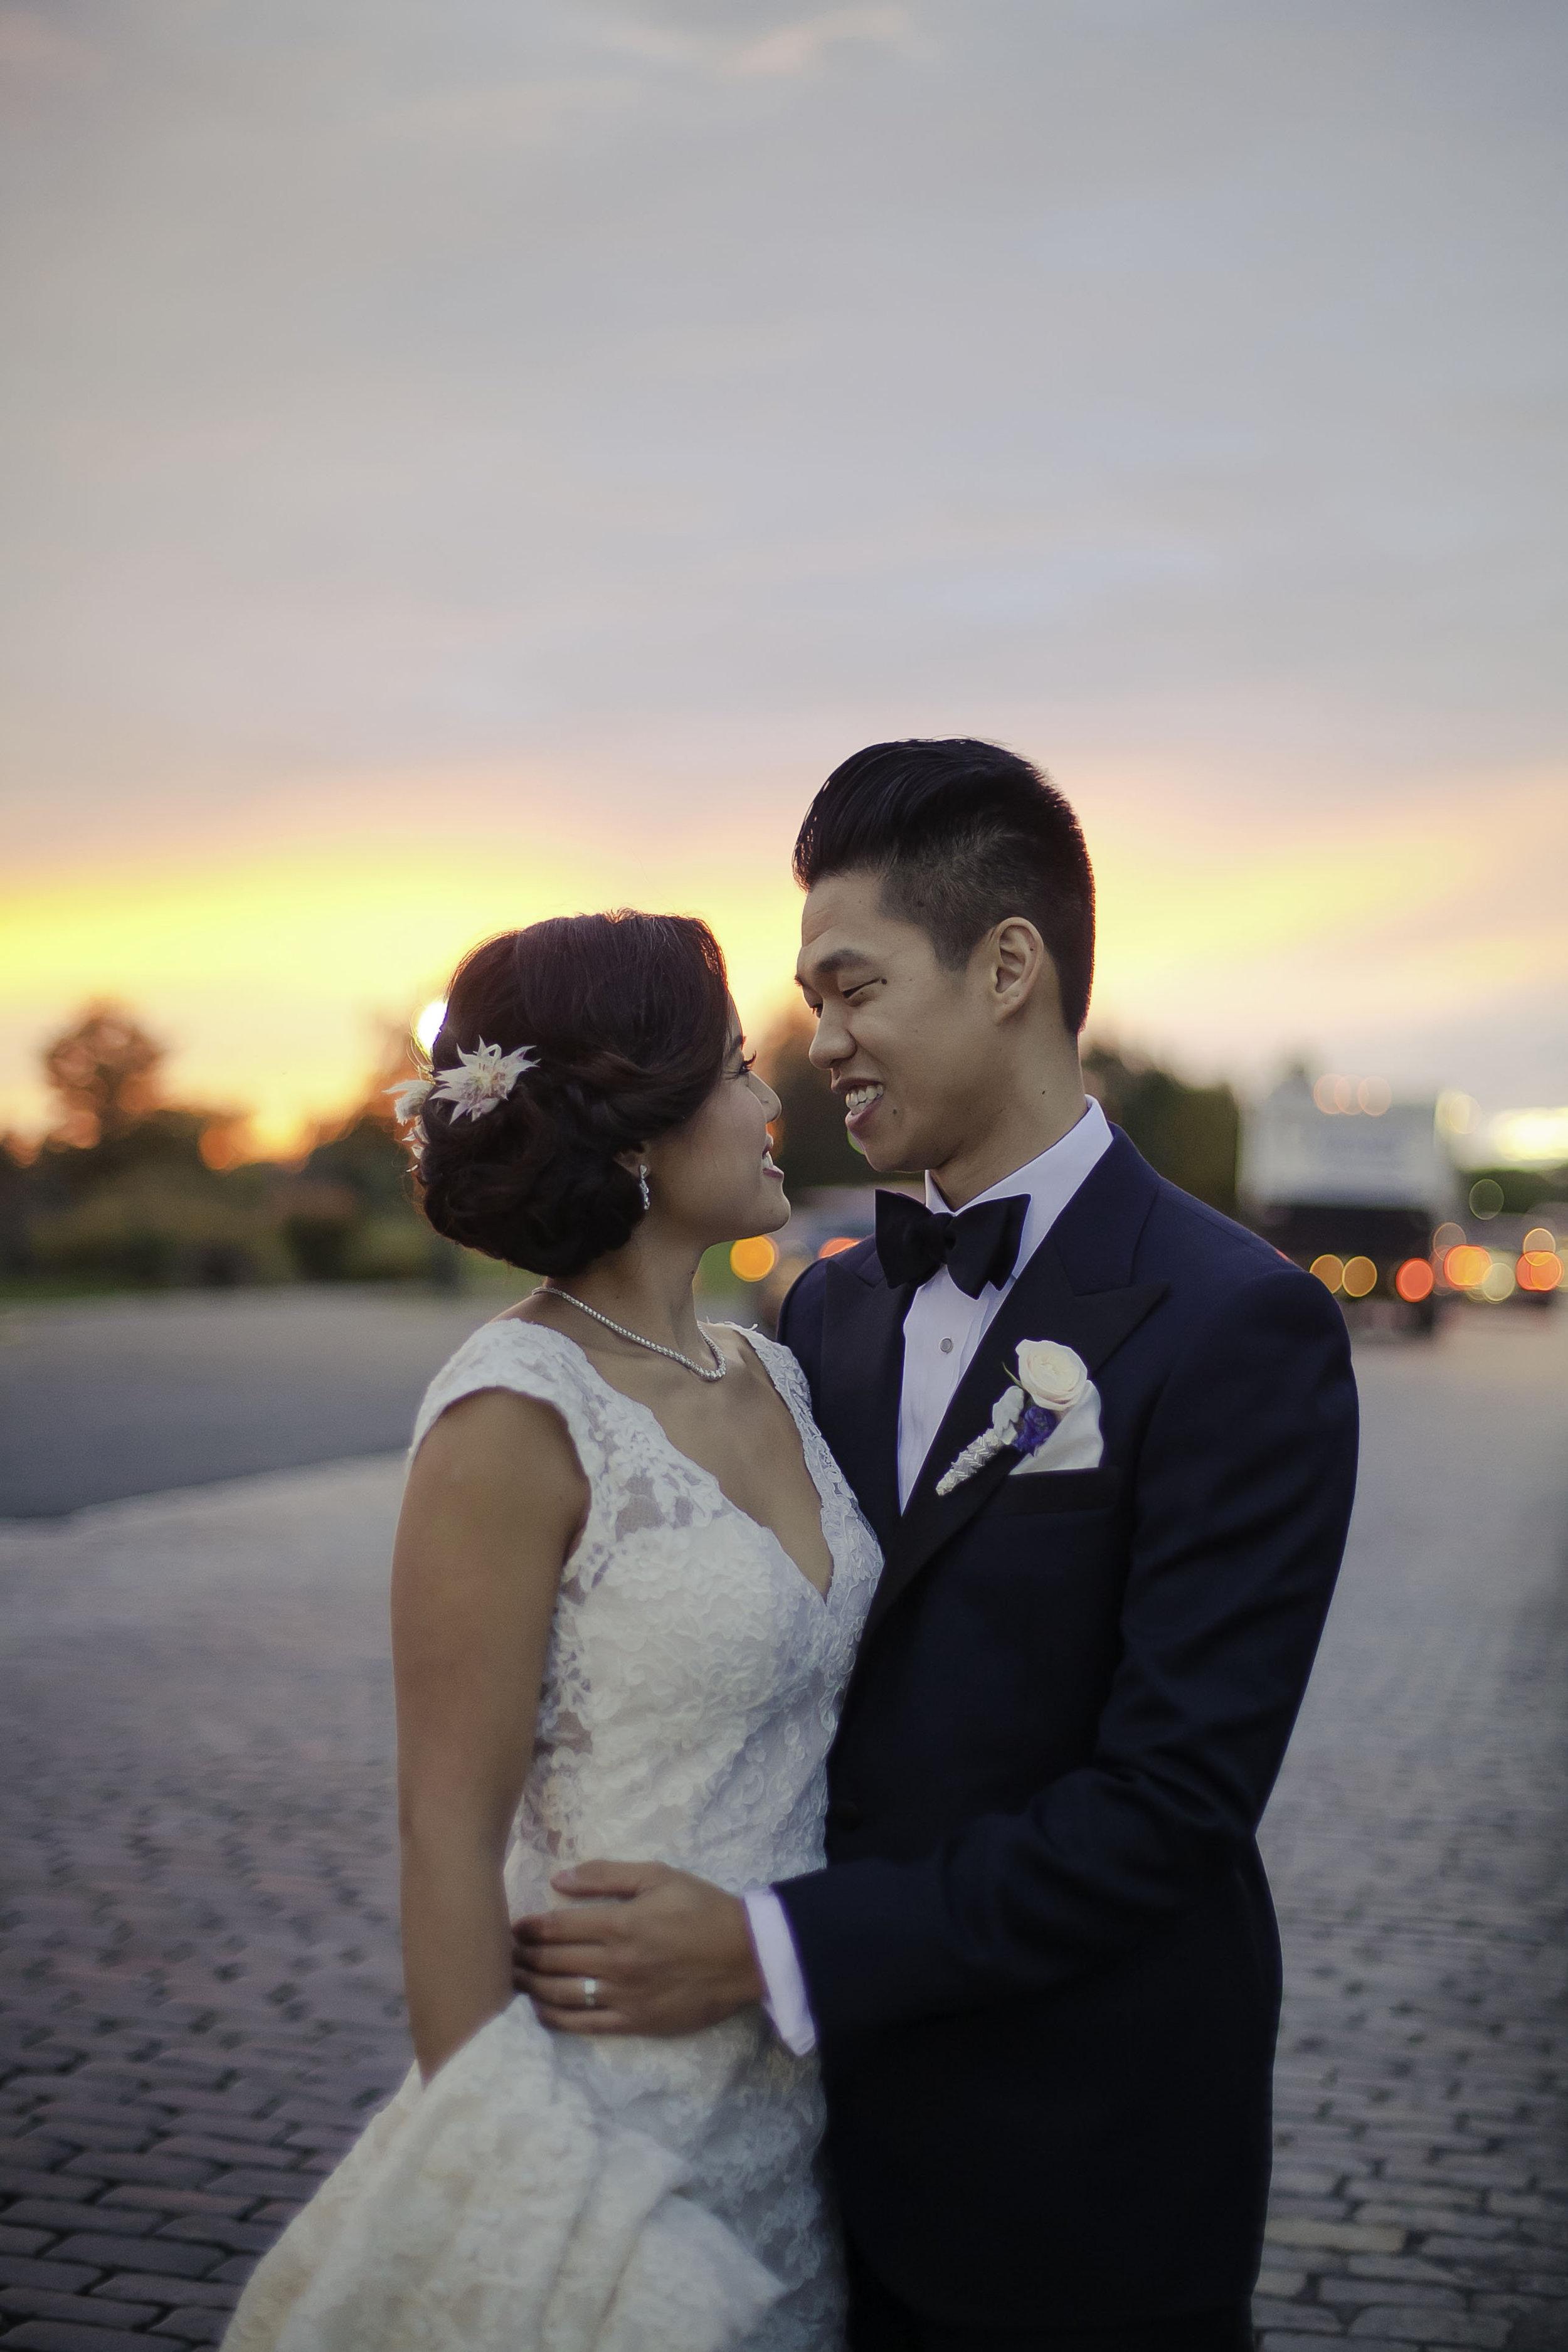 Courtney Calvin s Wedding 10 8 14-1court and cal wedding day-0729.jpg